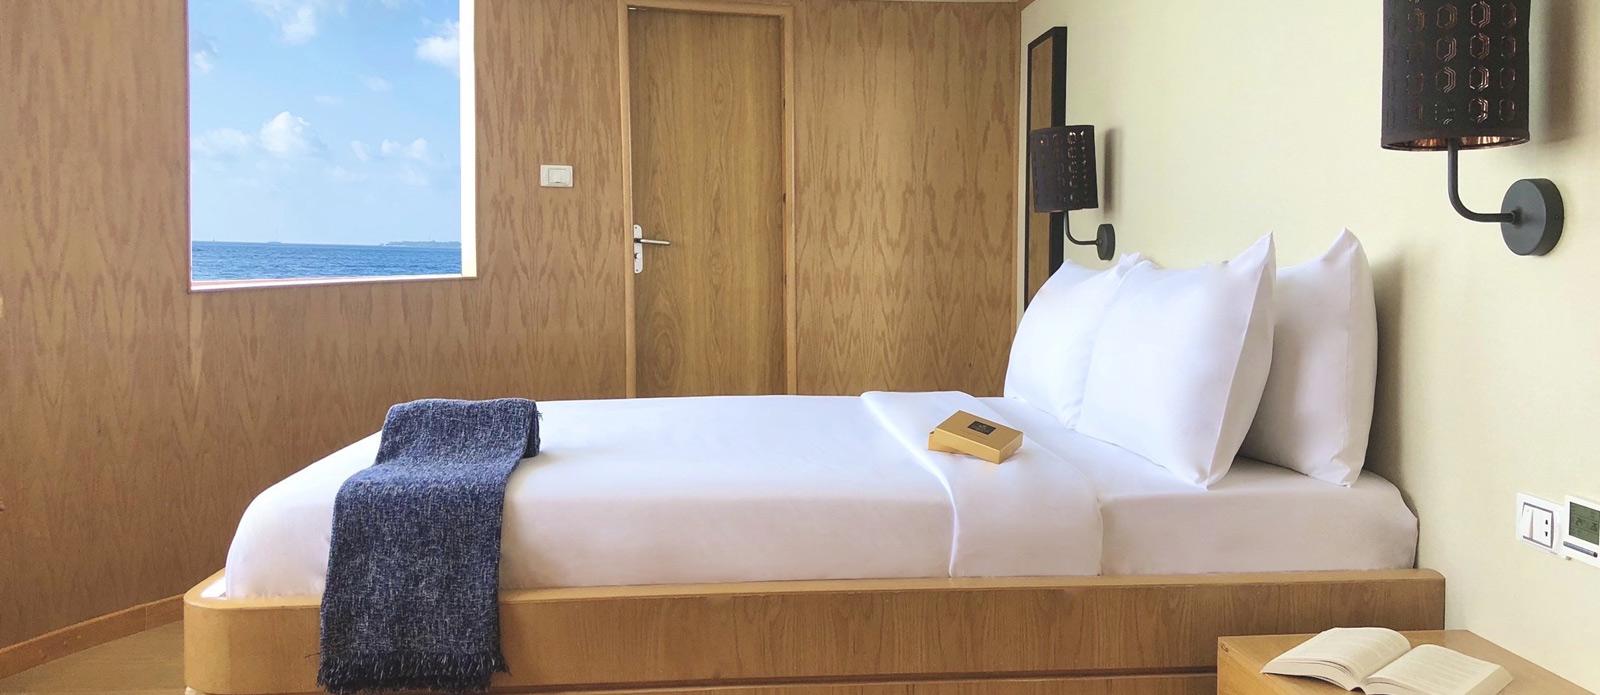 Safira-Luxury-Yacht-For-Sale-Interior-10